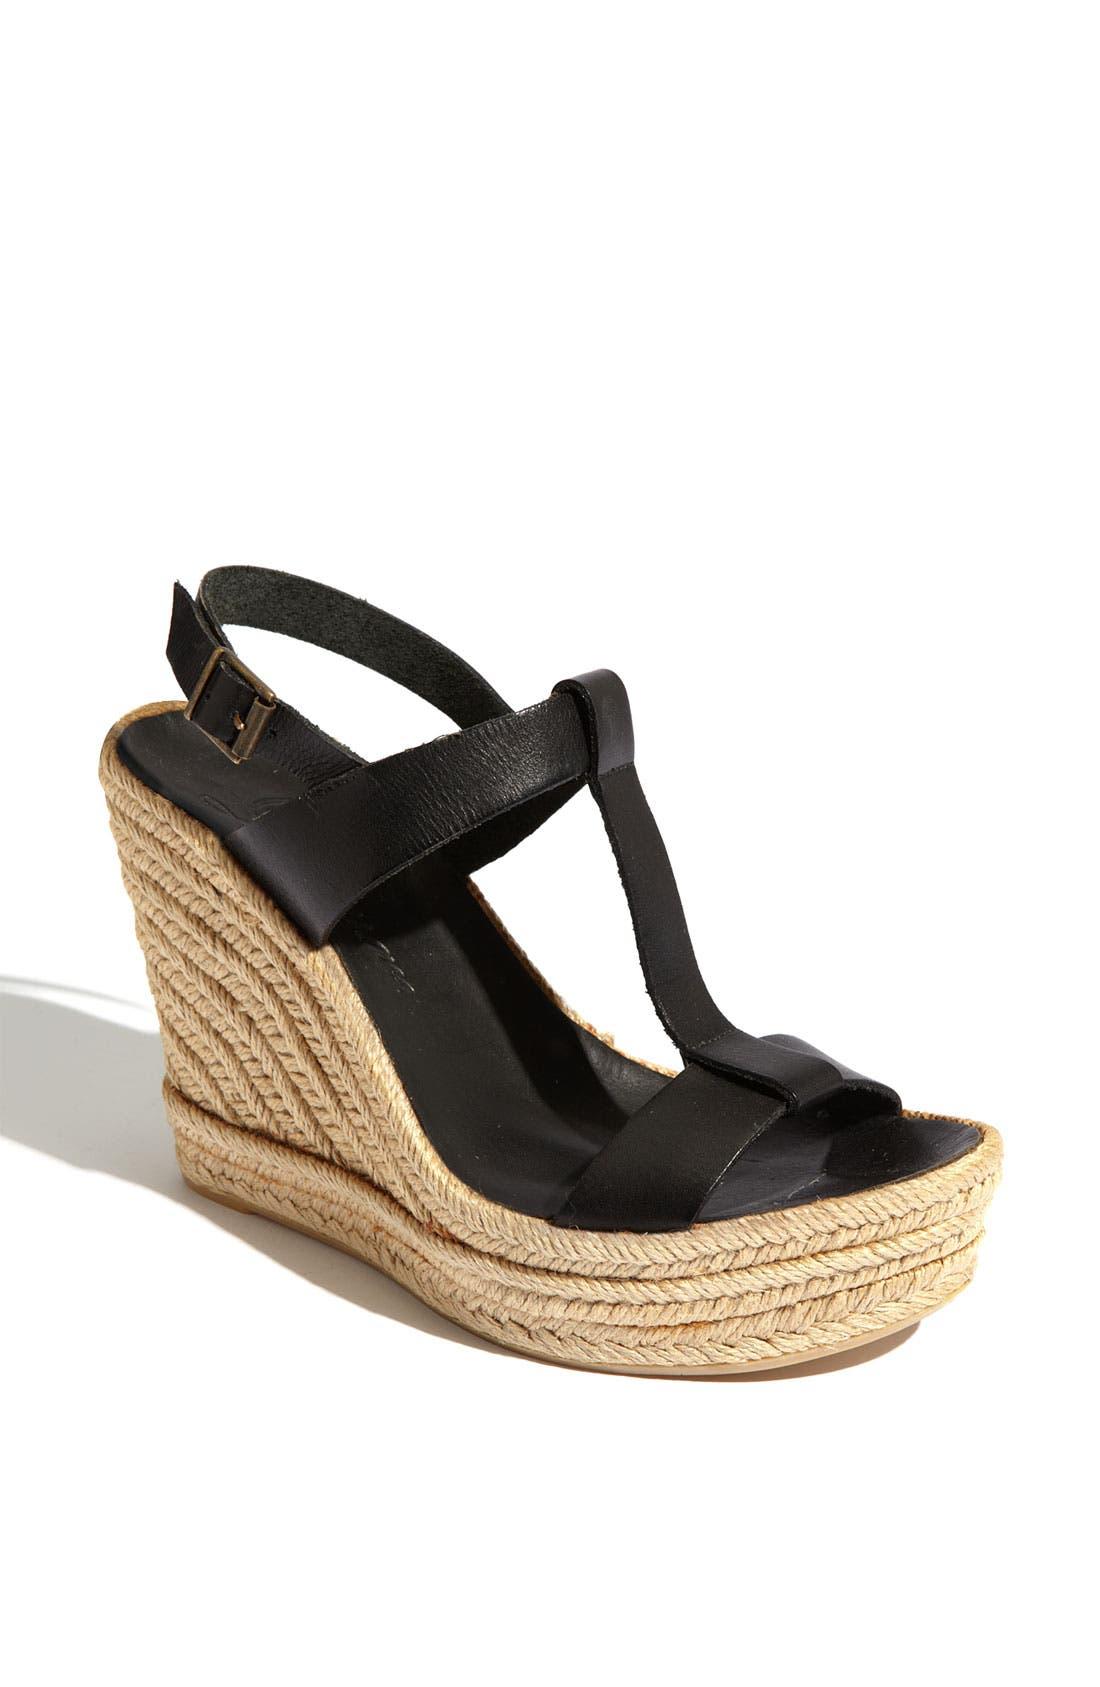 Alternate Image 1 Selected - Delman 'Trish' Sandal (Online Only)